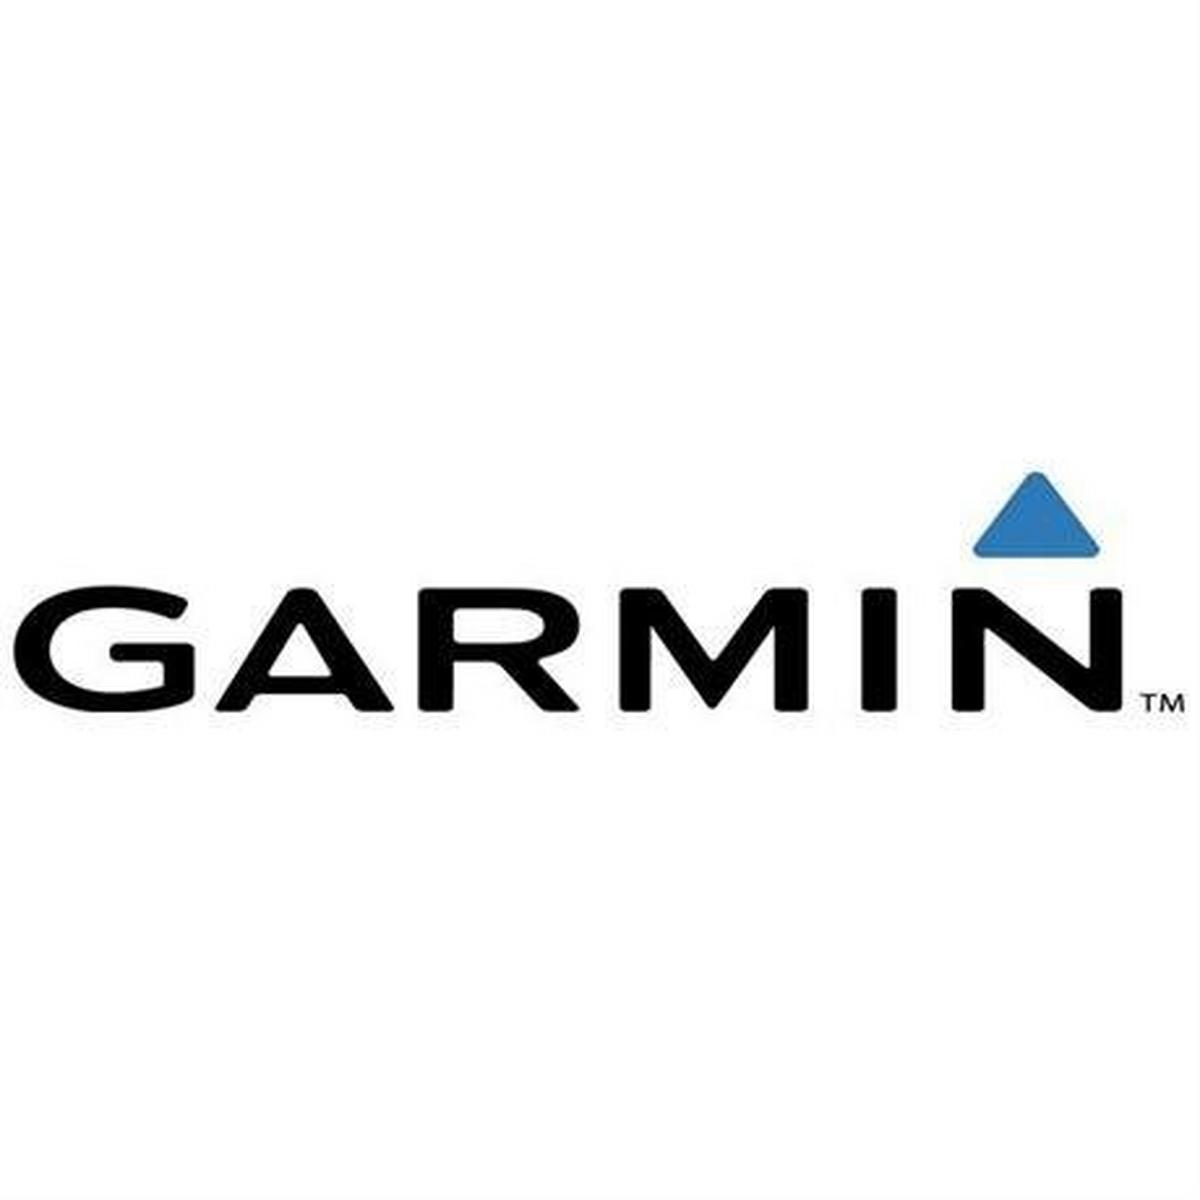 Garmin GPS Spare/Accessory: Carabiner Clip